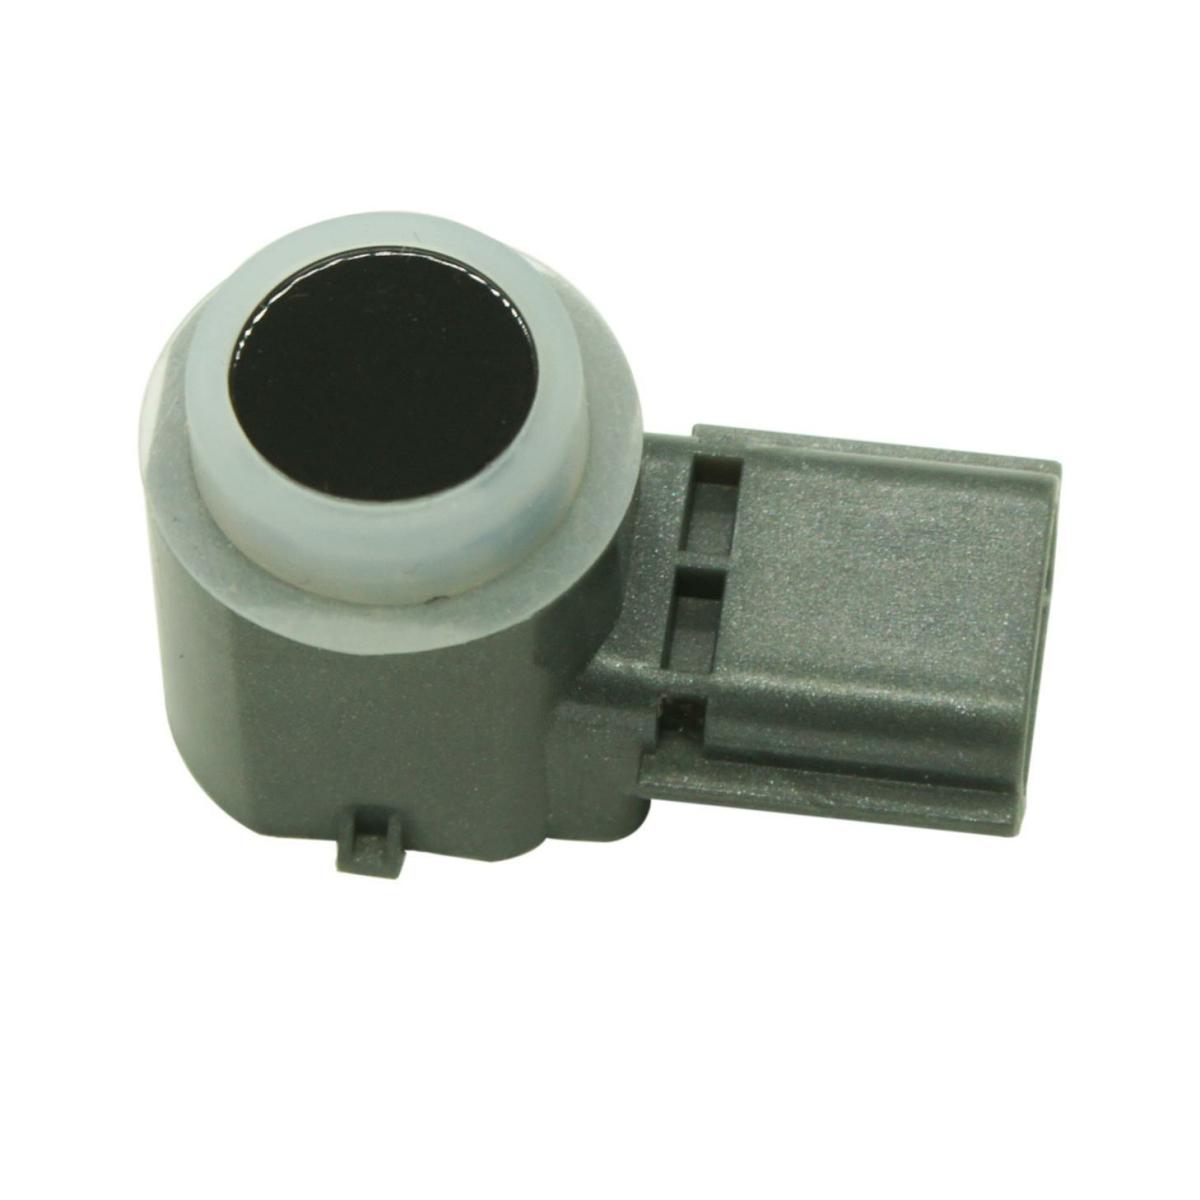 Parksensor 28438-3SH0B für Infiniti PDC Parktronic